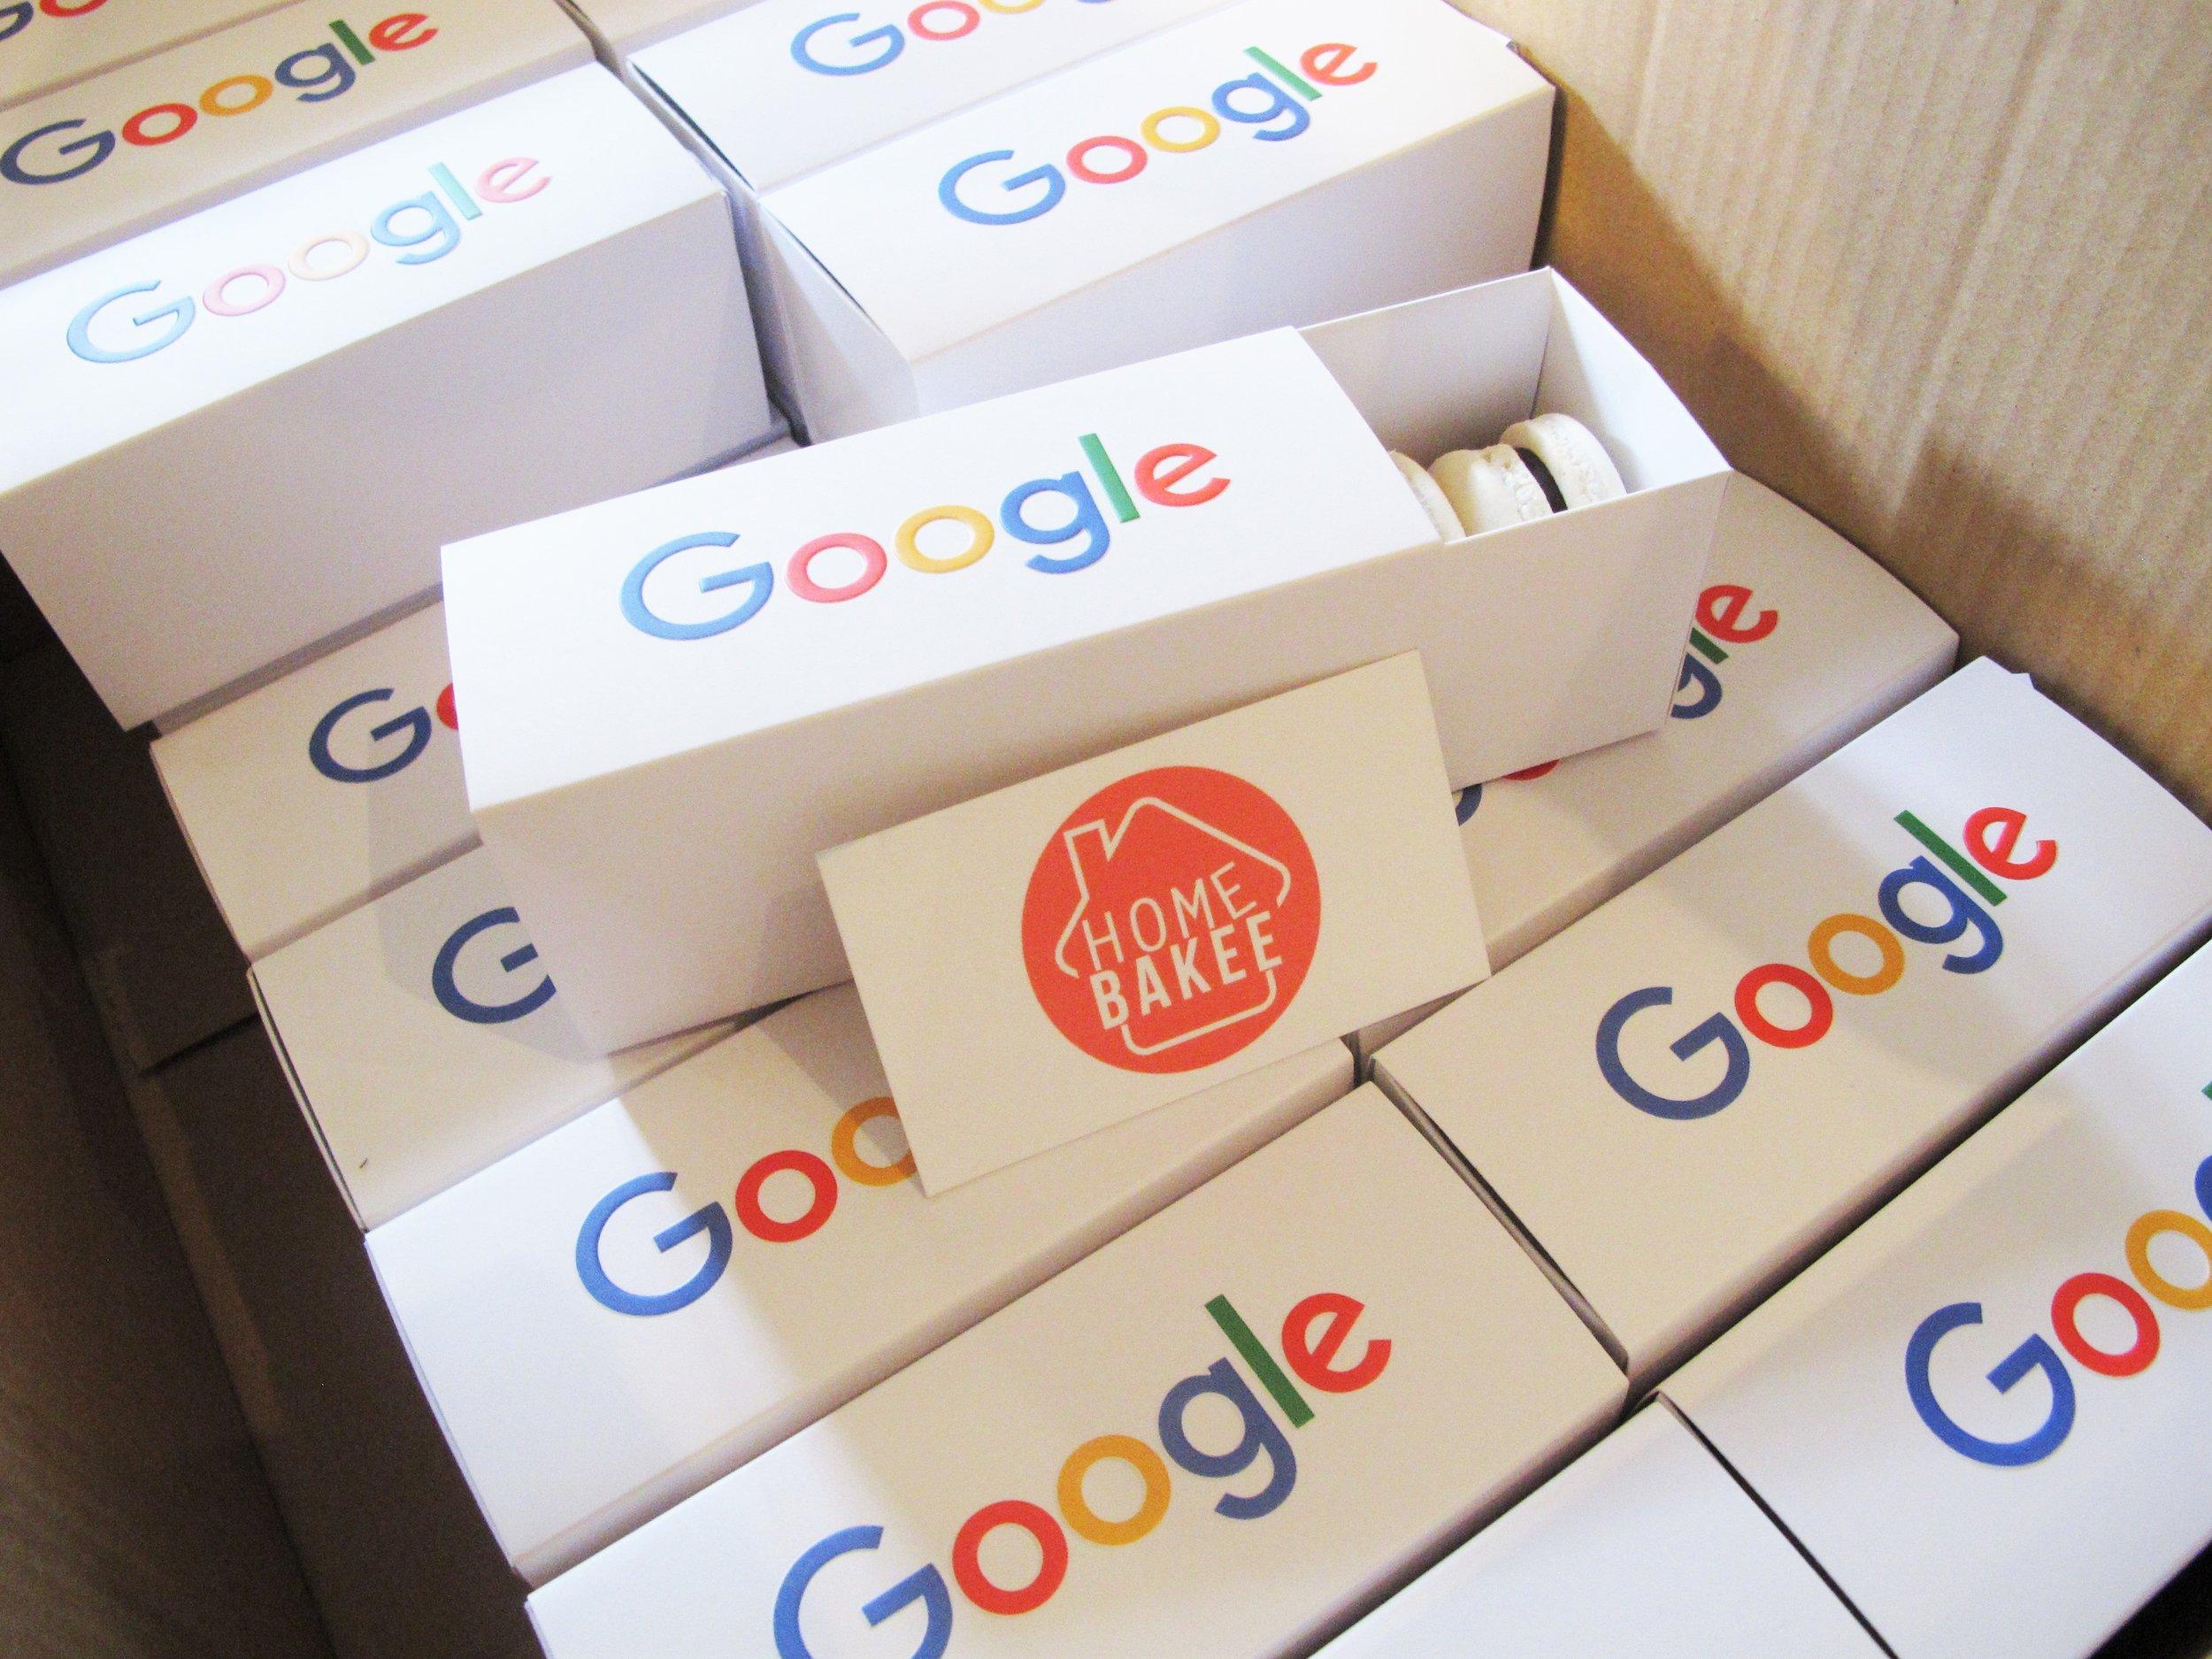 Google Corporate Macarons.jpg